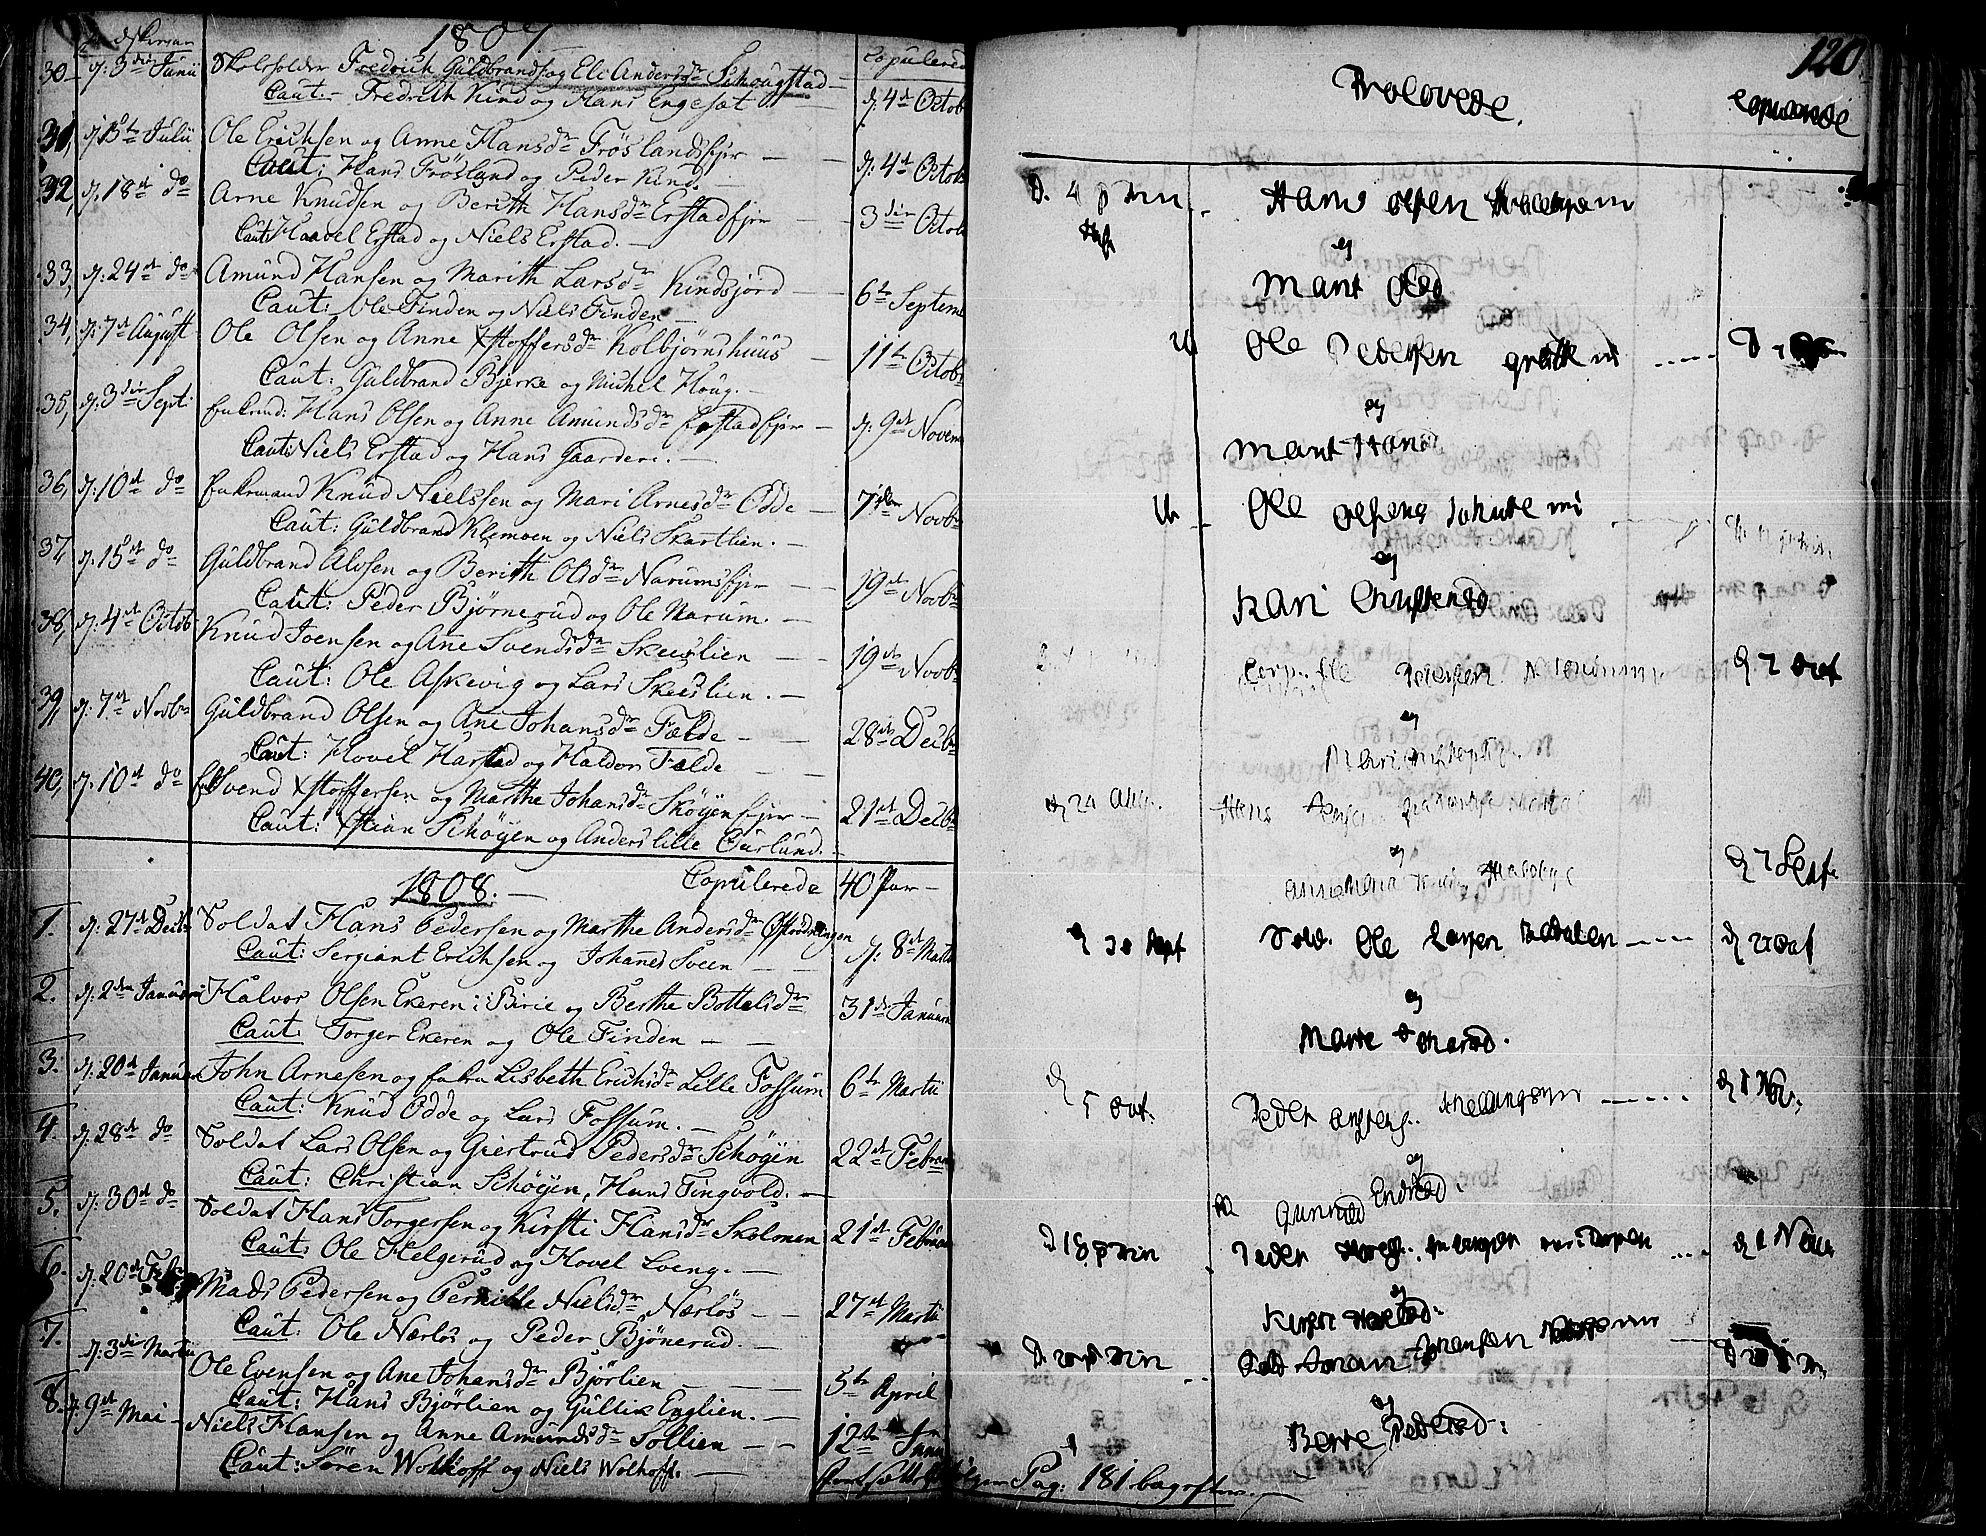 SAH, Land prestekontor, Ministerialbok nr. 6, 1784-1813, s. 120